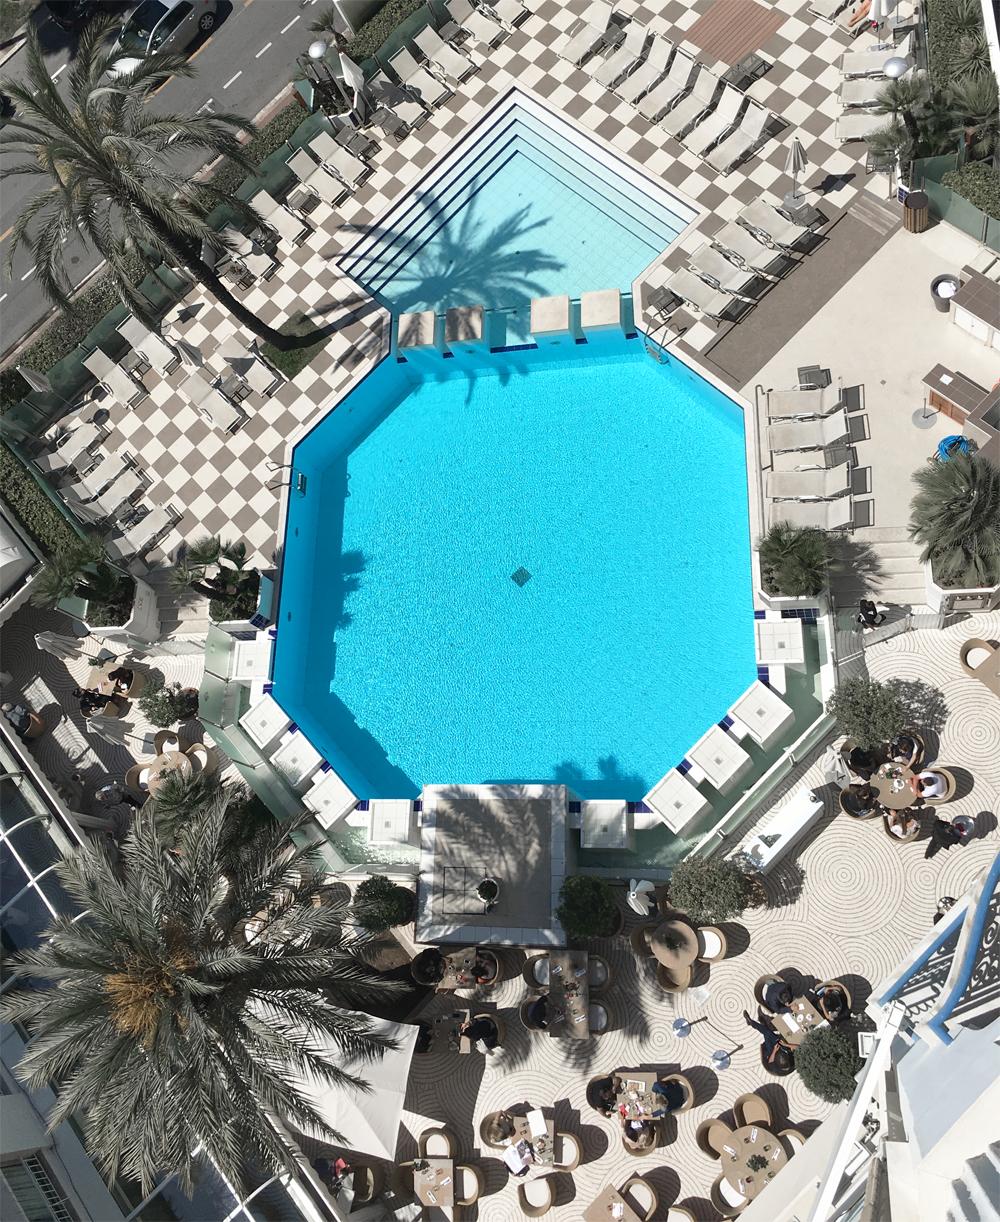 martinez-hotel-PISCINE-1